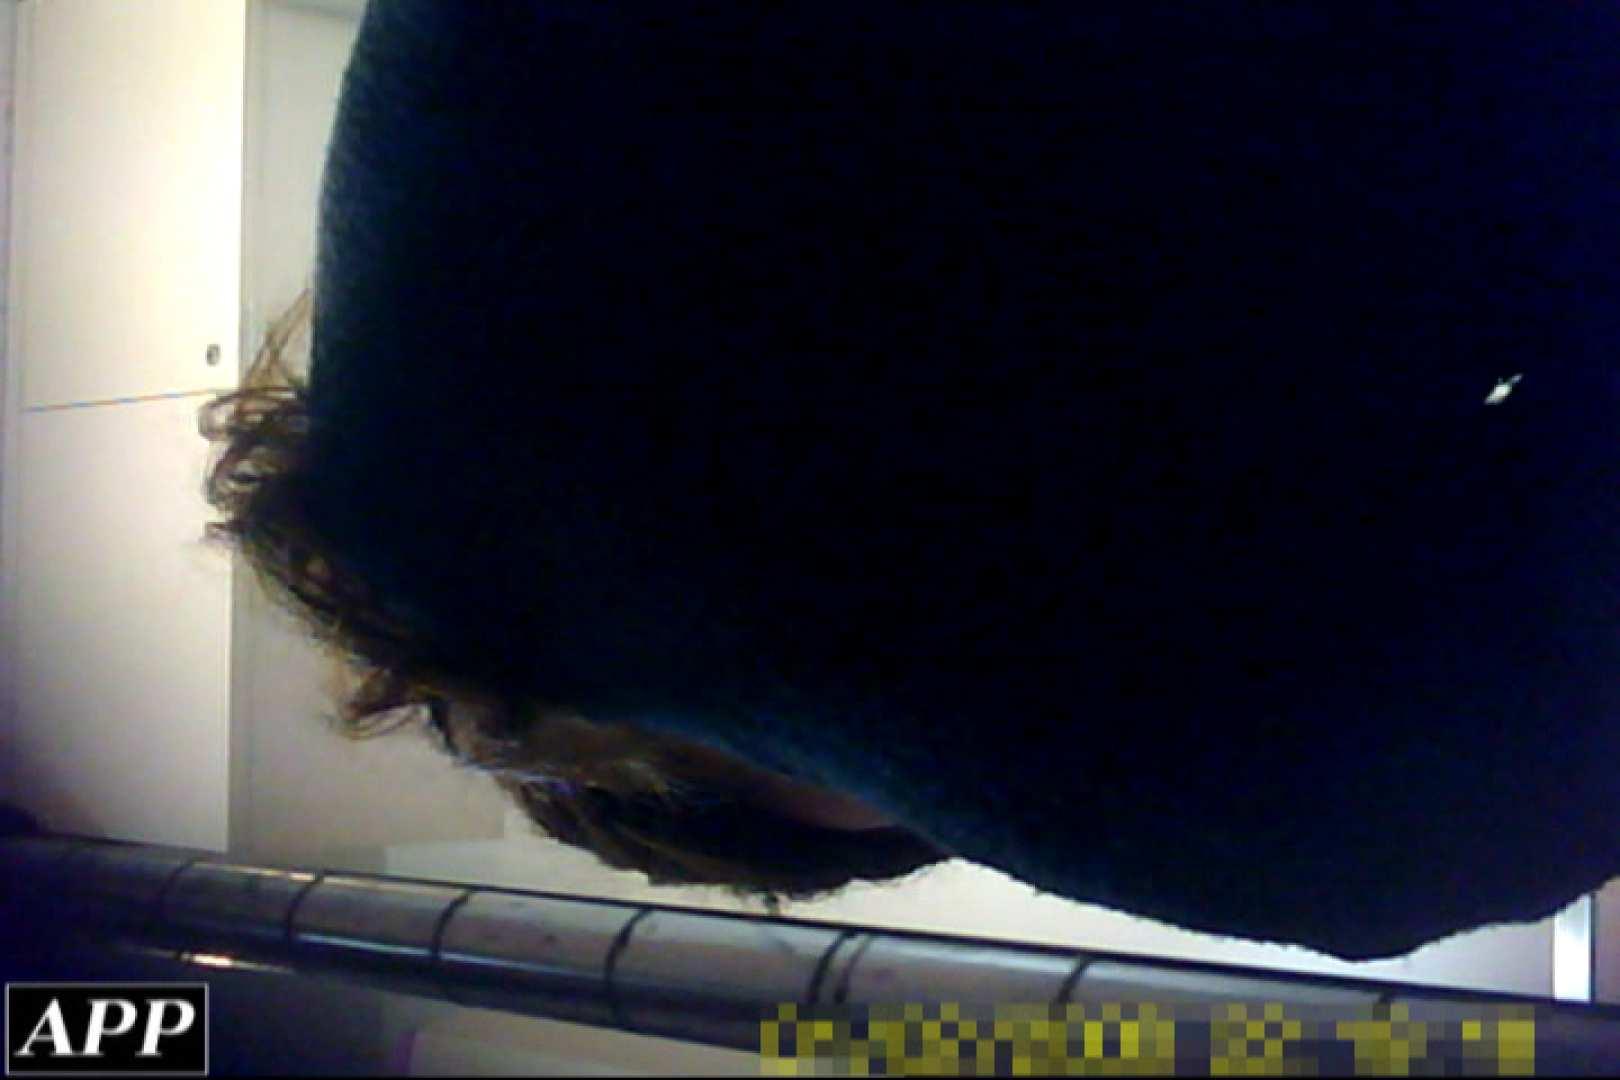 3視点洗面所 vol.110 OLハメ撮り  111Pix 5